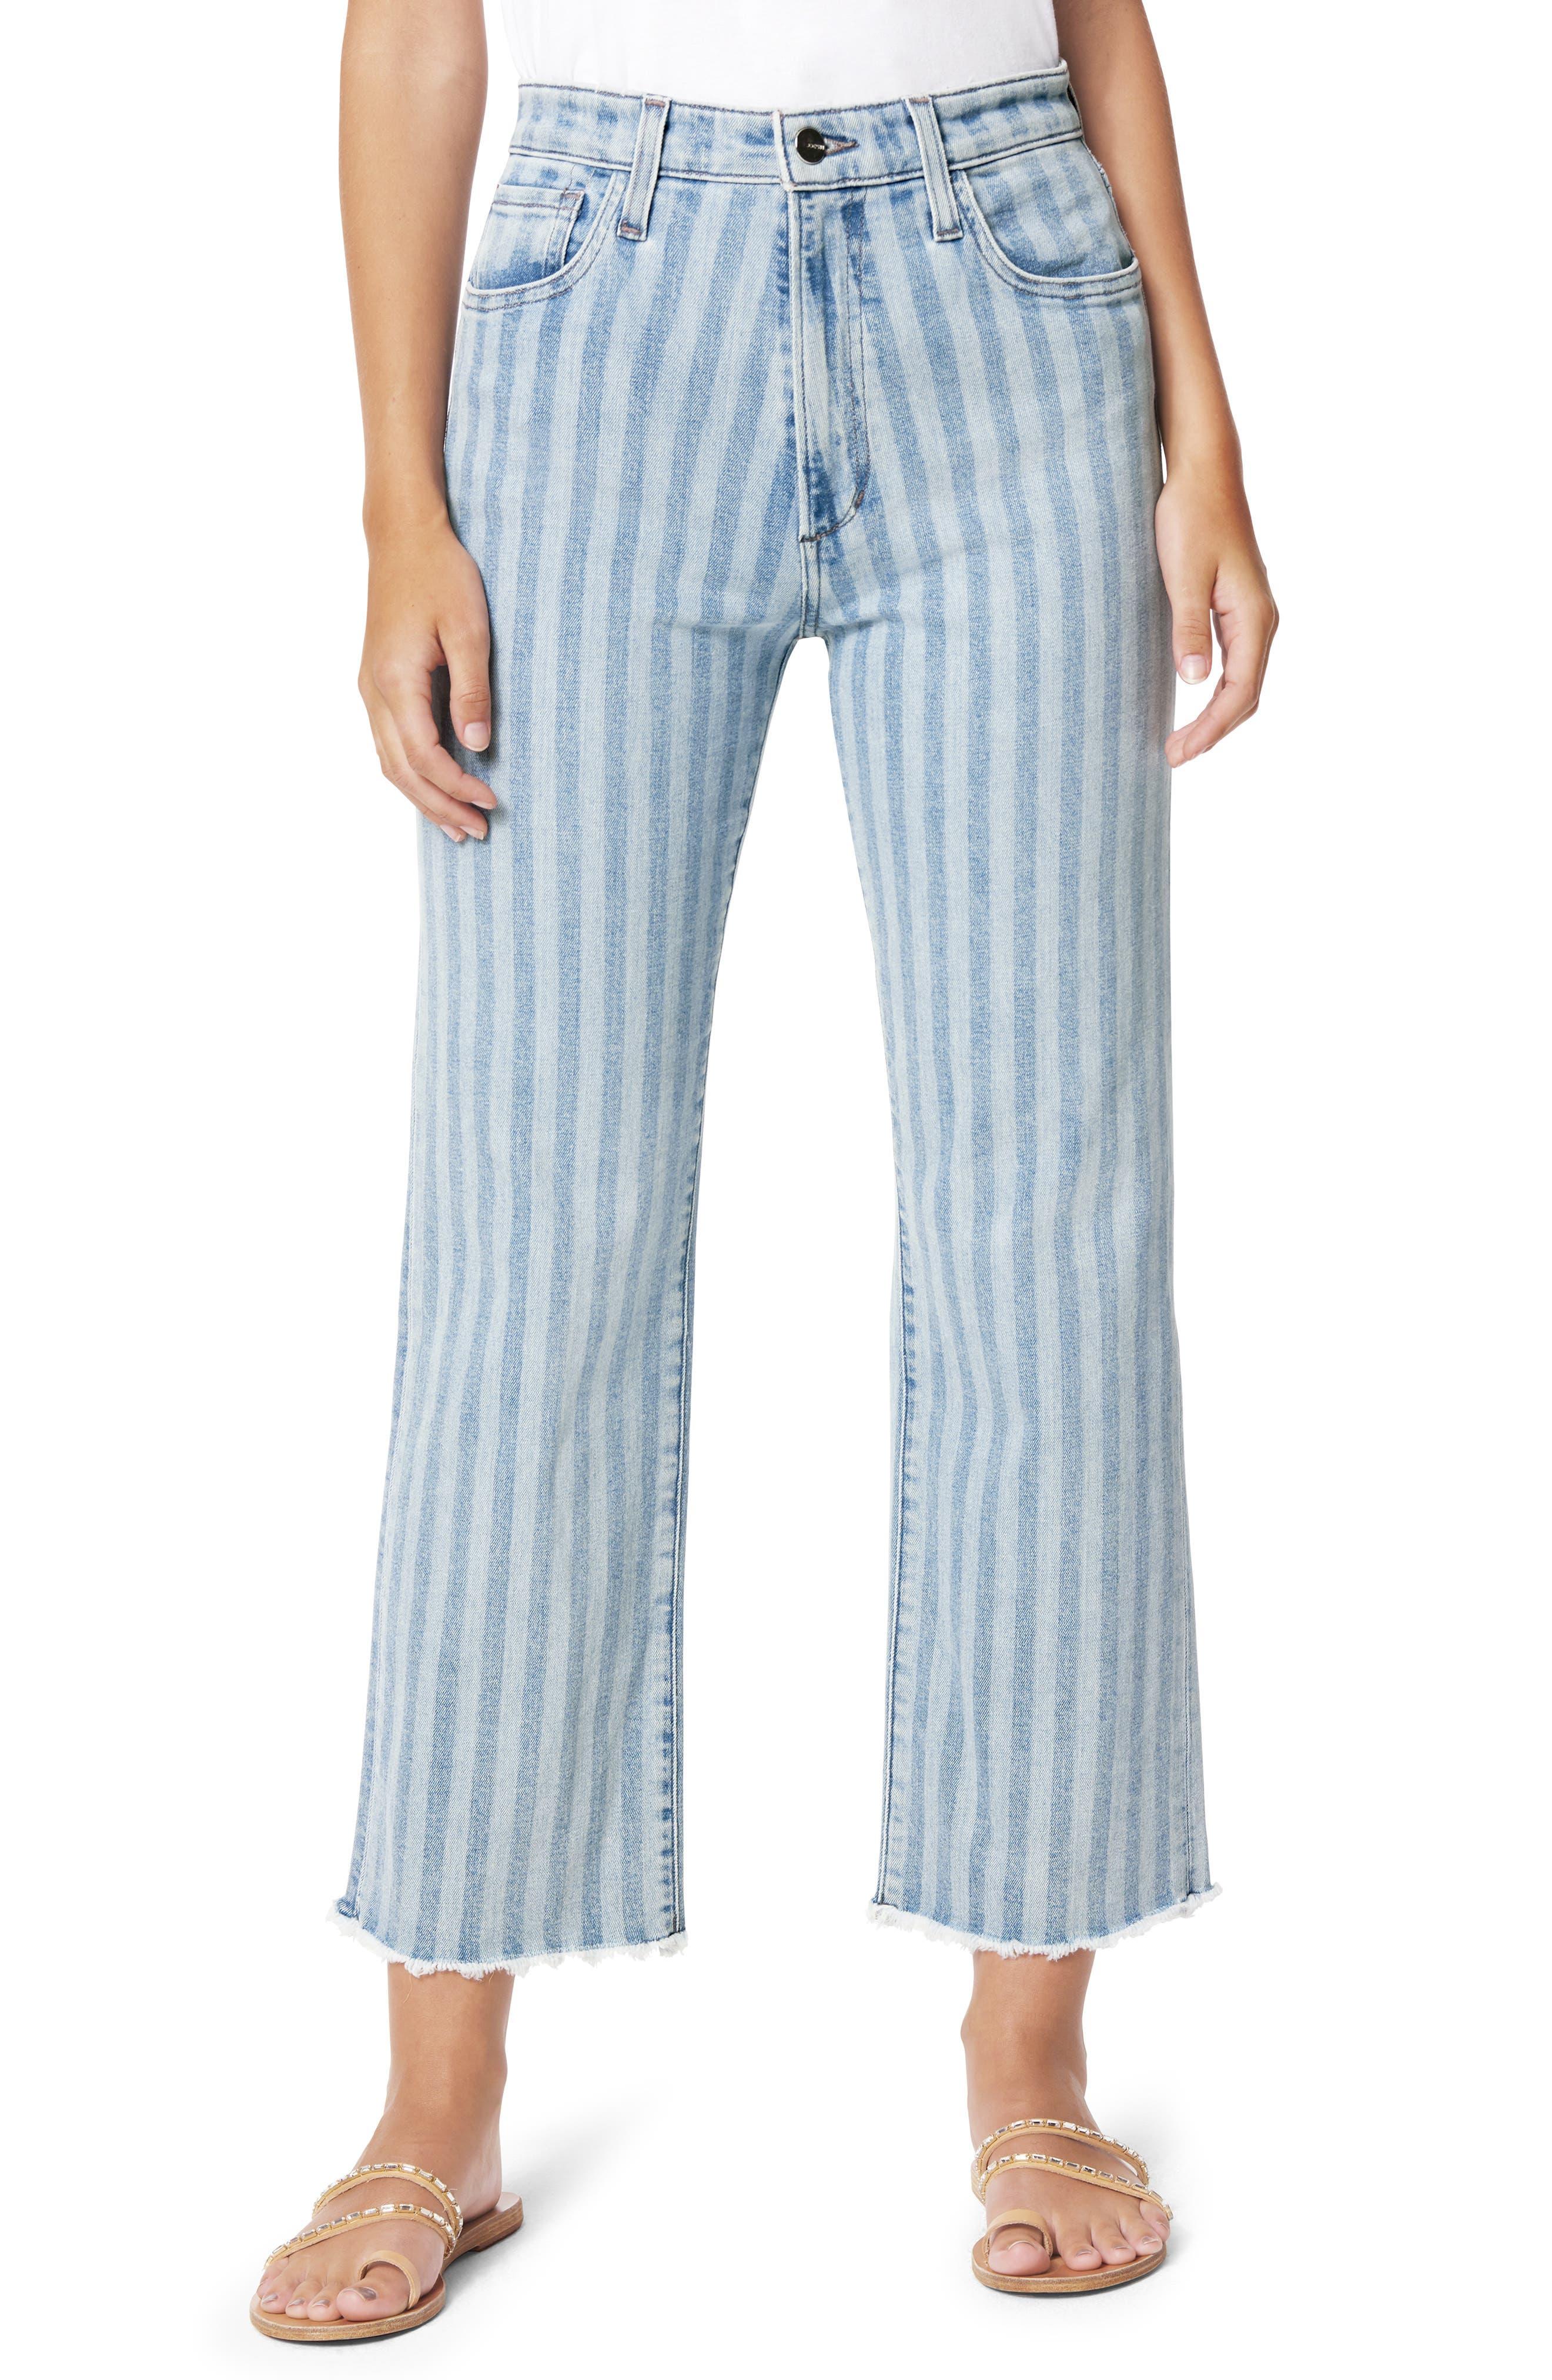 The Blake Stripe Fray Hem Crop Jeans